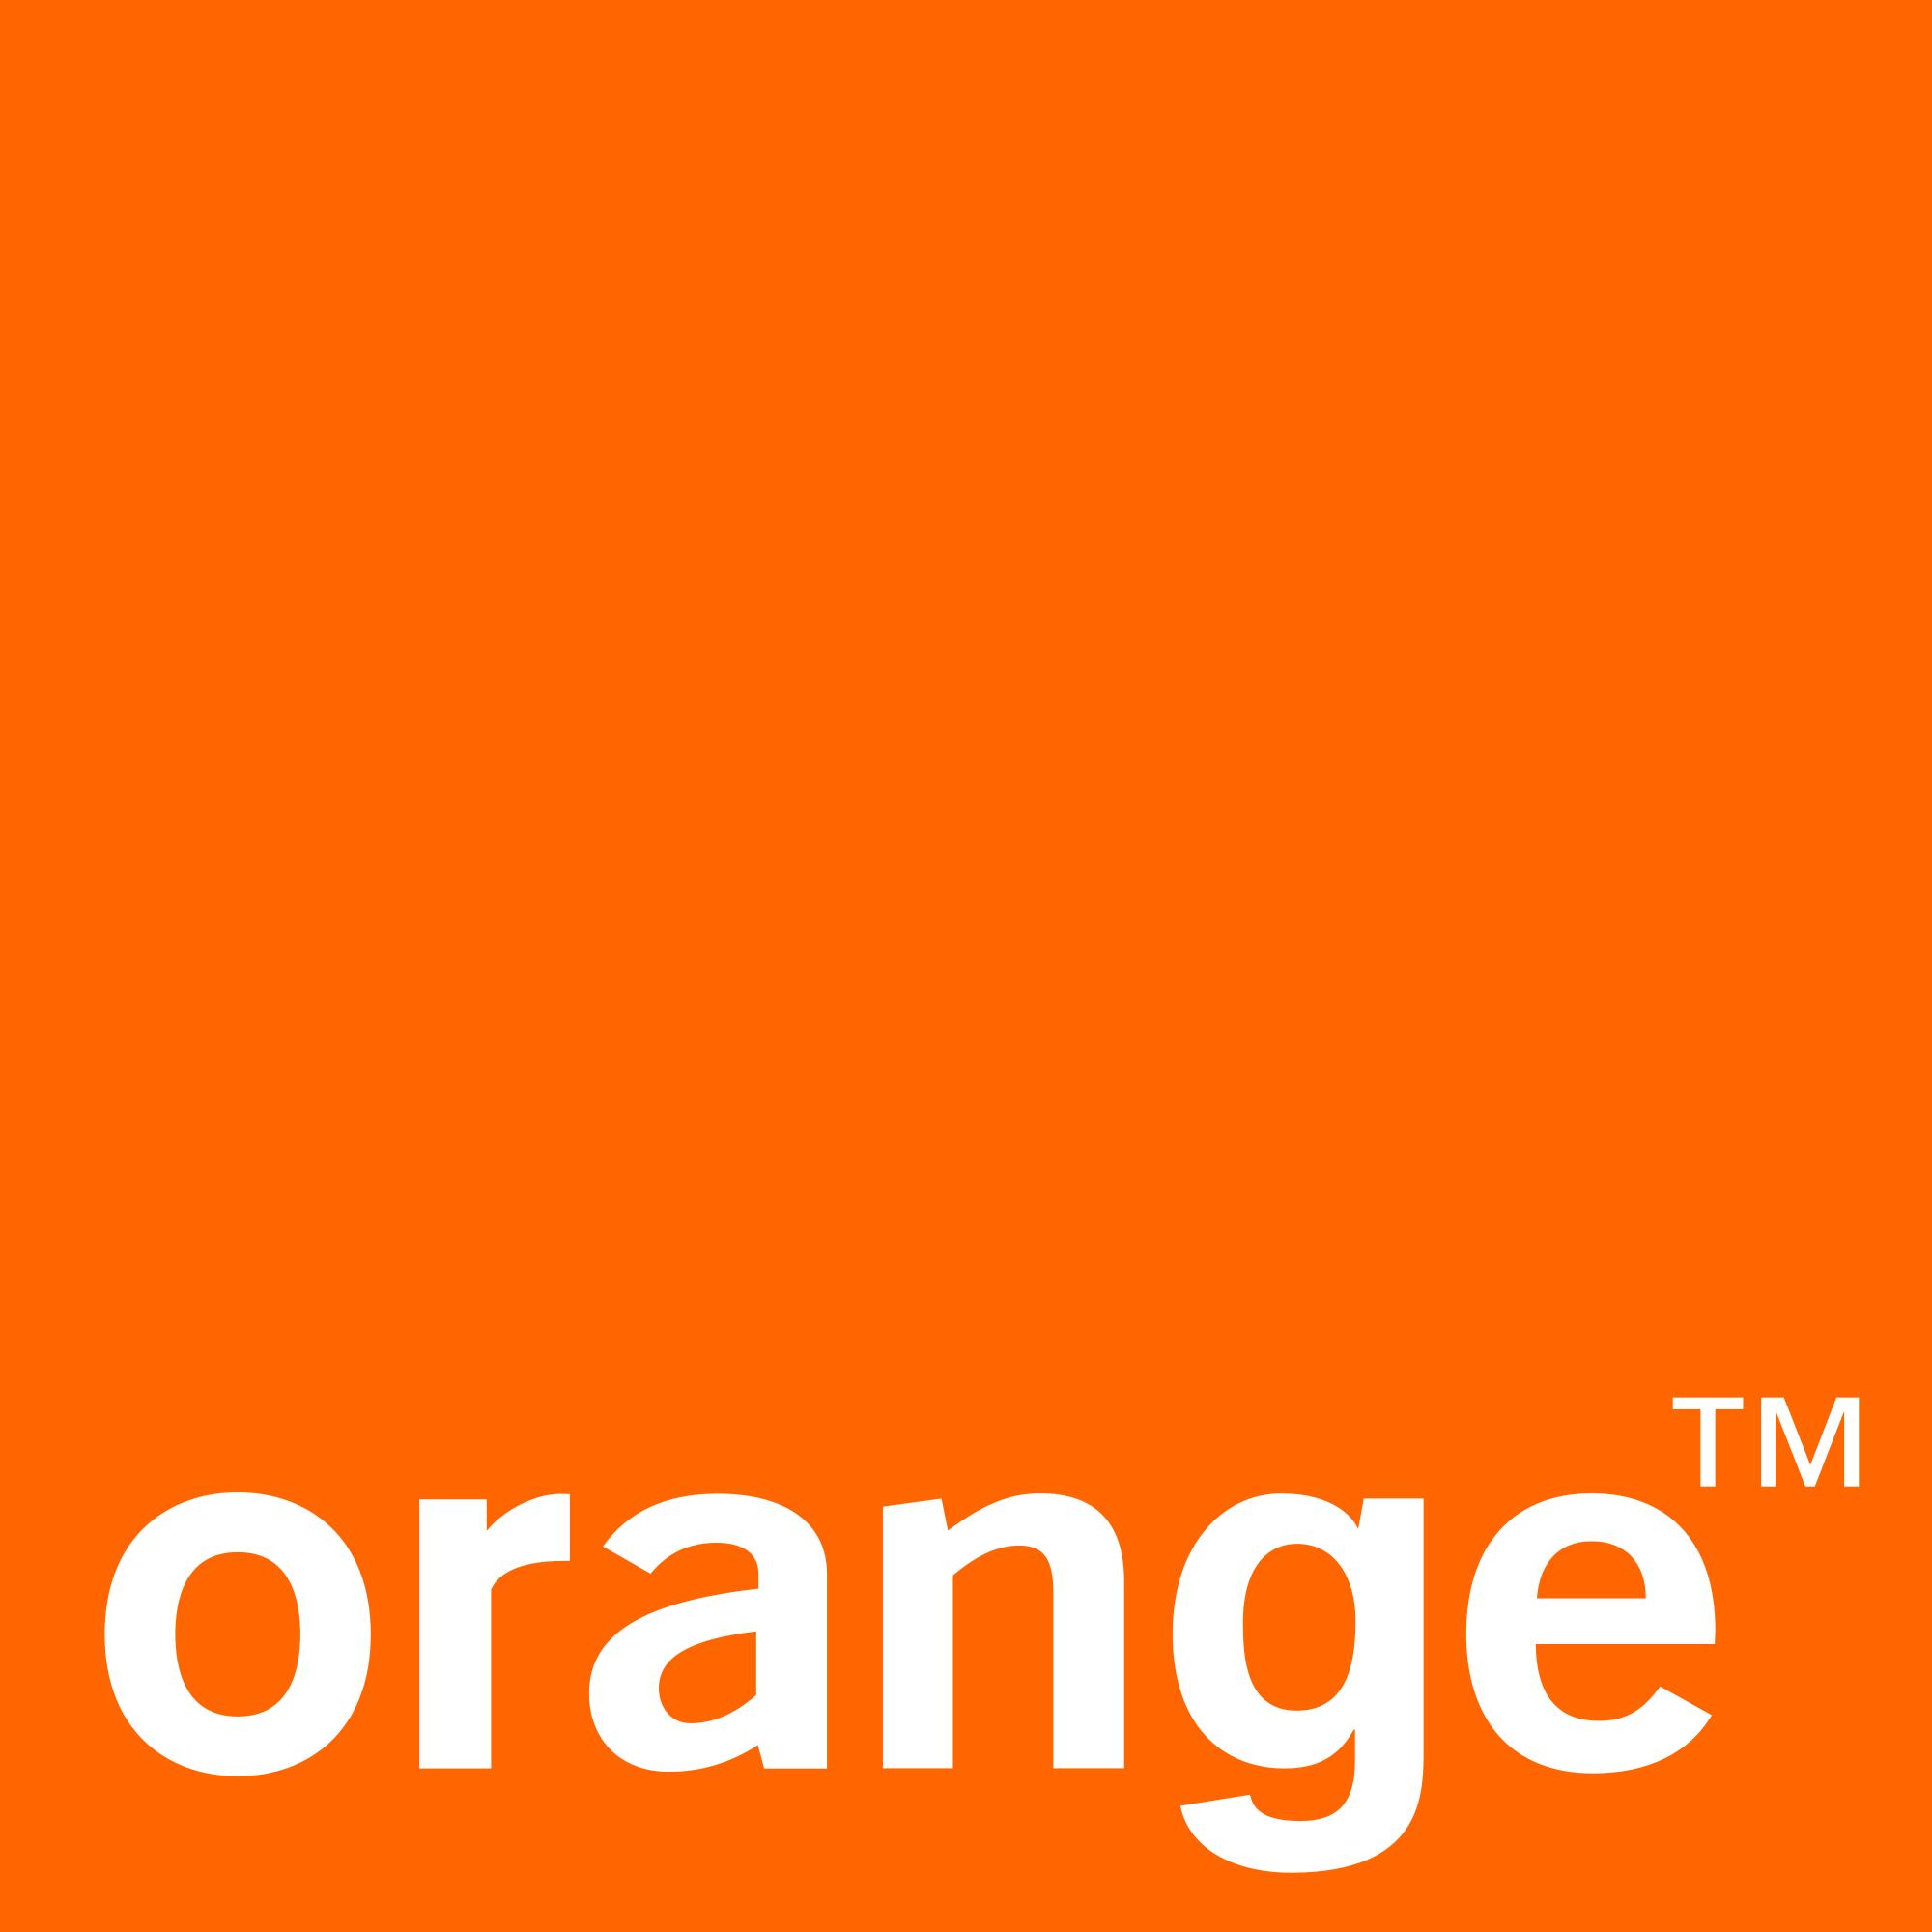 Orange Fondation